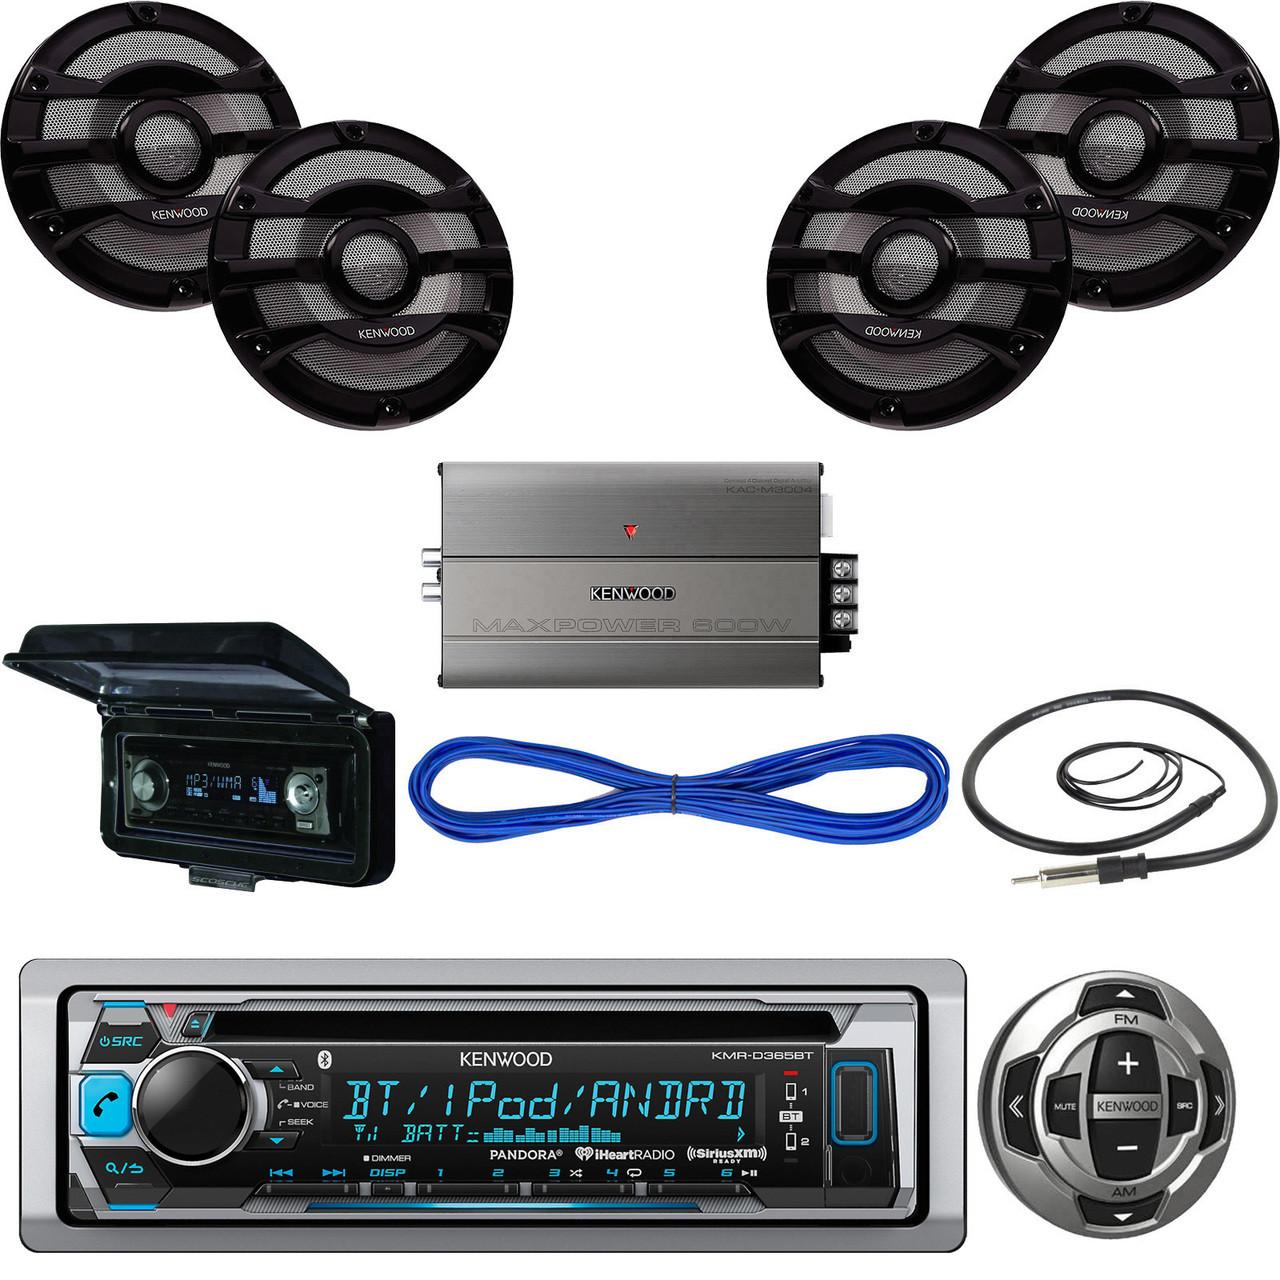 medium resolution of kenwood kmr d358 wiring harness wiring library panasonic wiring diagram car audio wiring diagram kenwood kmrd358